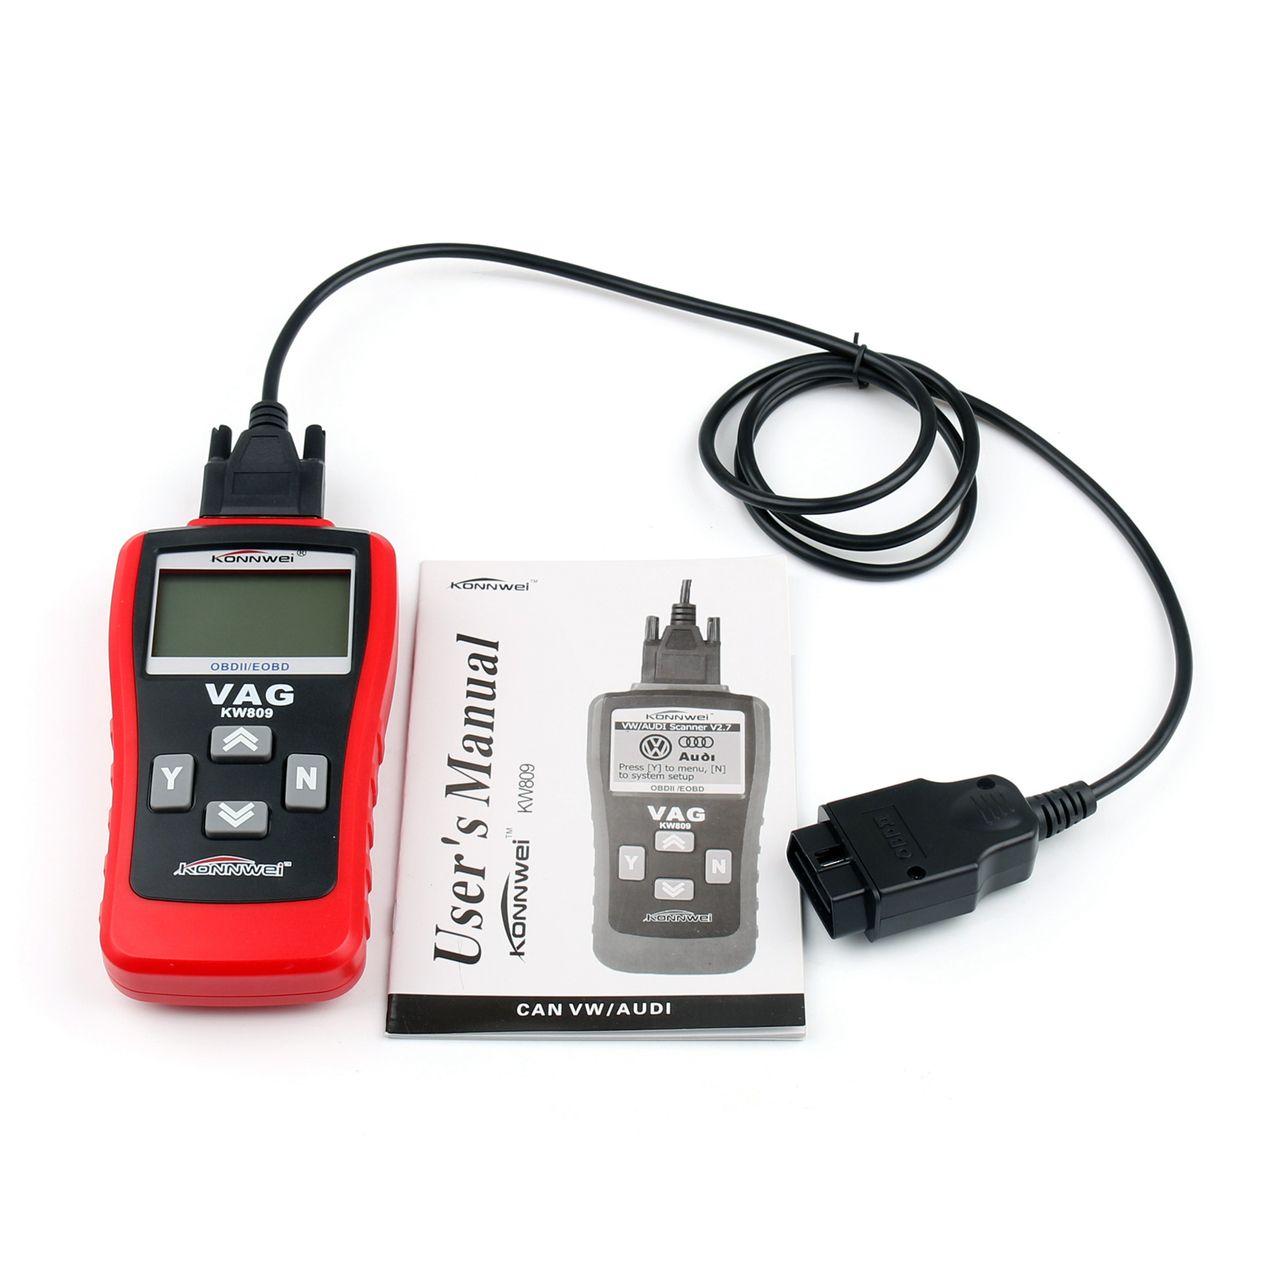 Mad Konnwei KW809 Car Diagnostic Scanner Tool